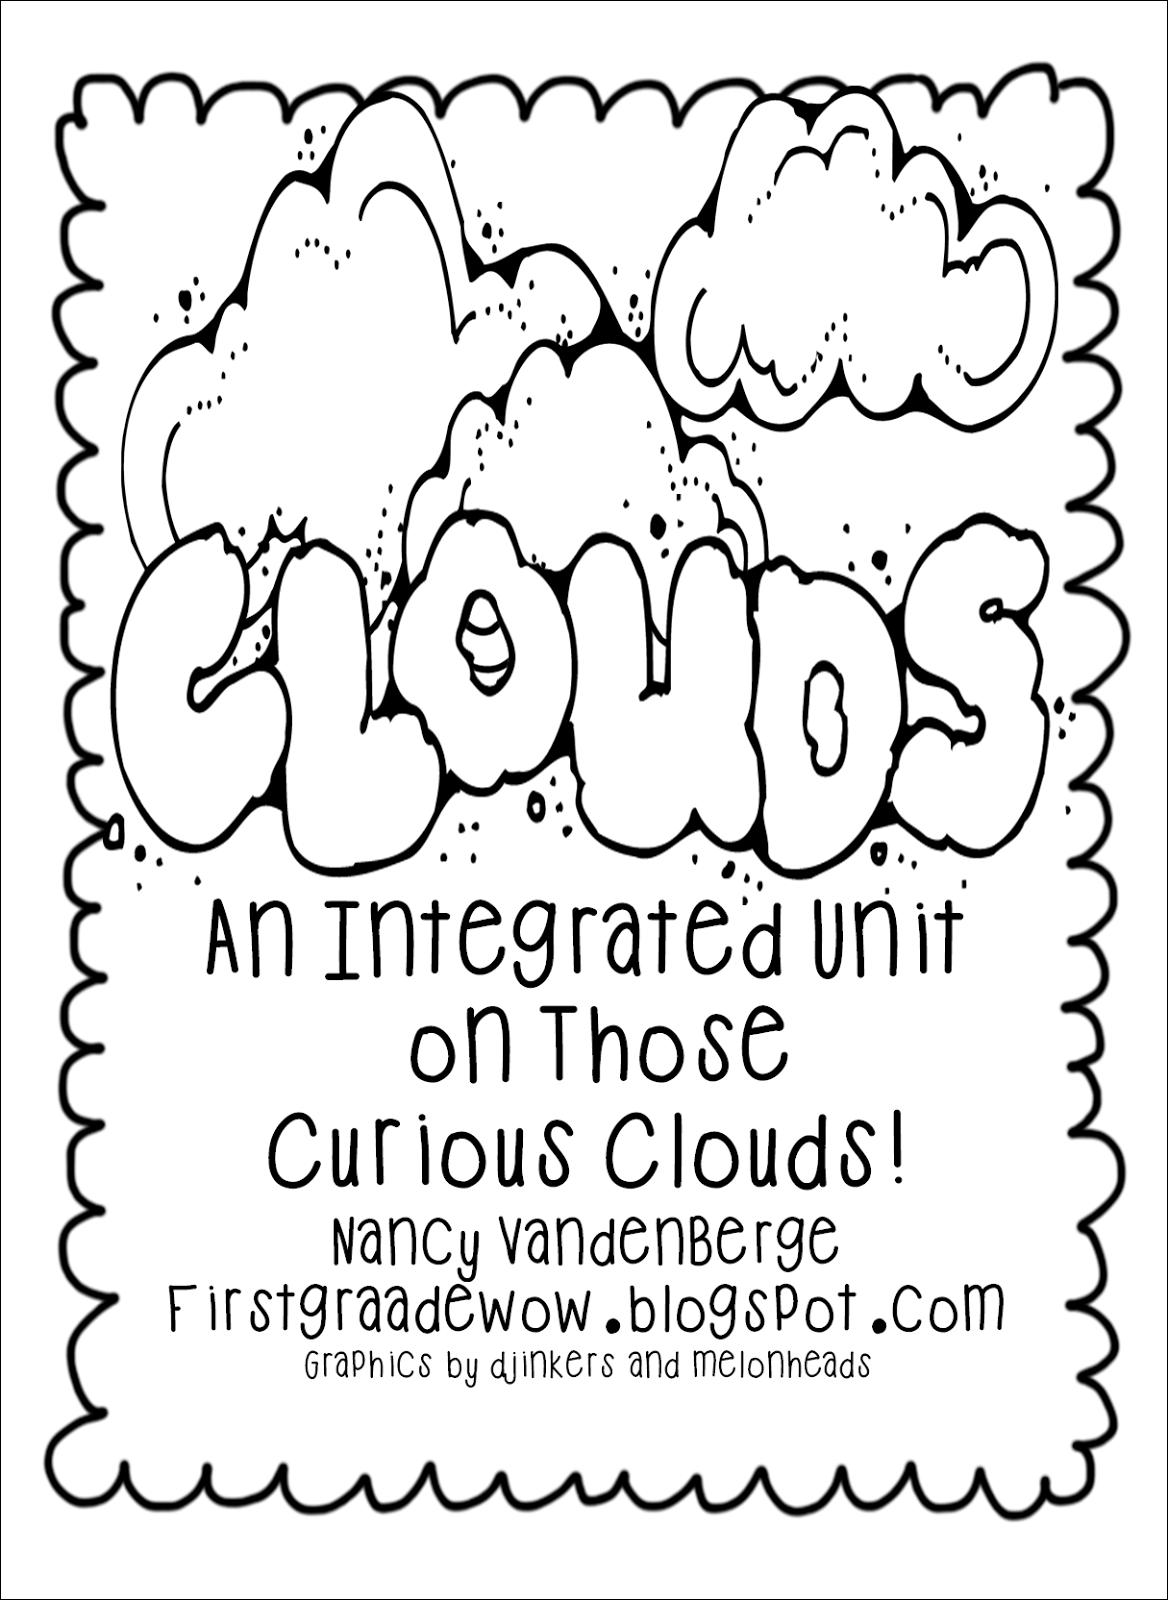 First Grade Wow: Curious Clouds